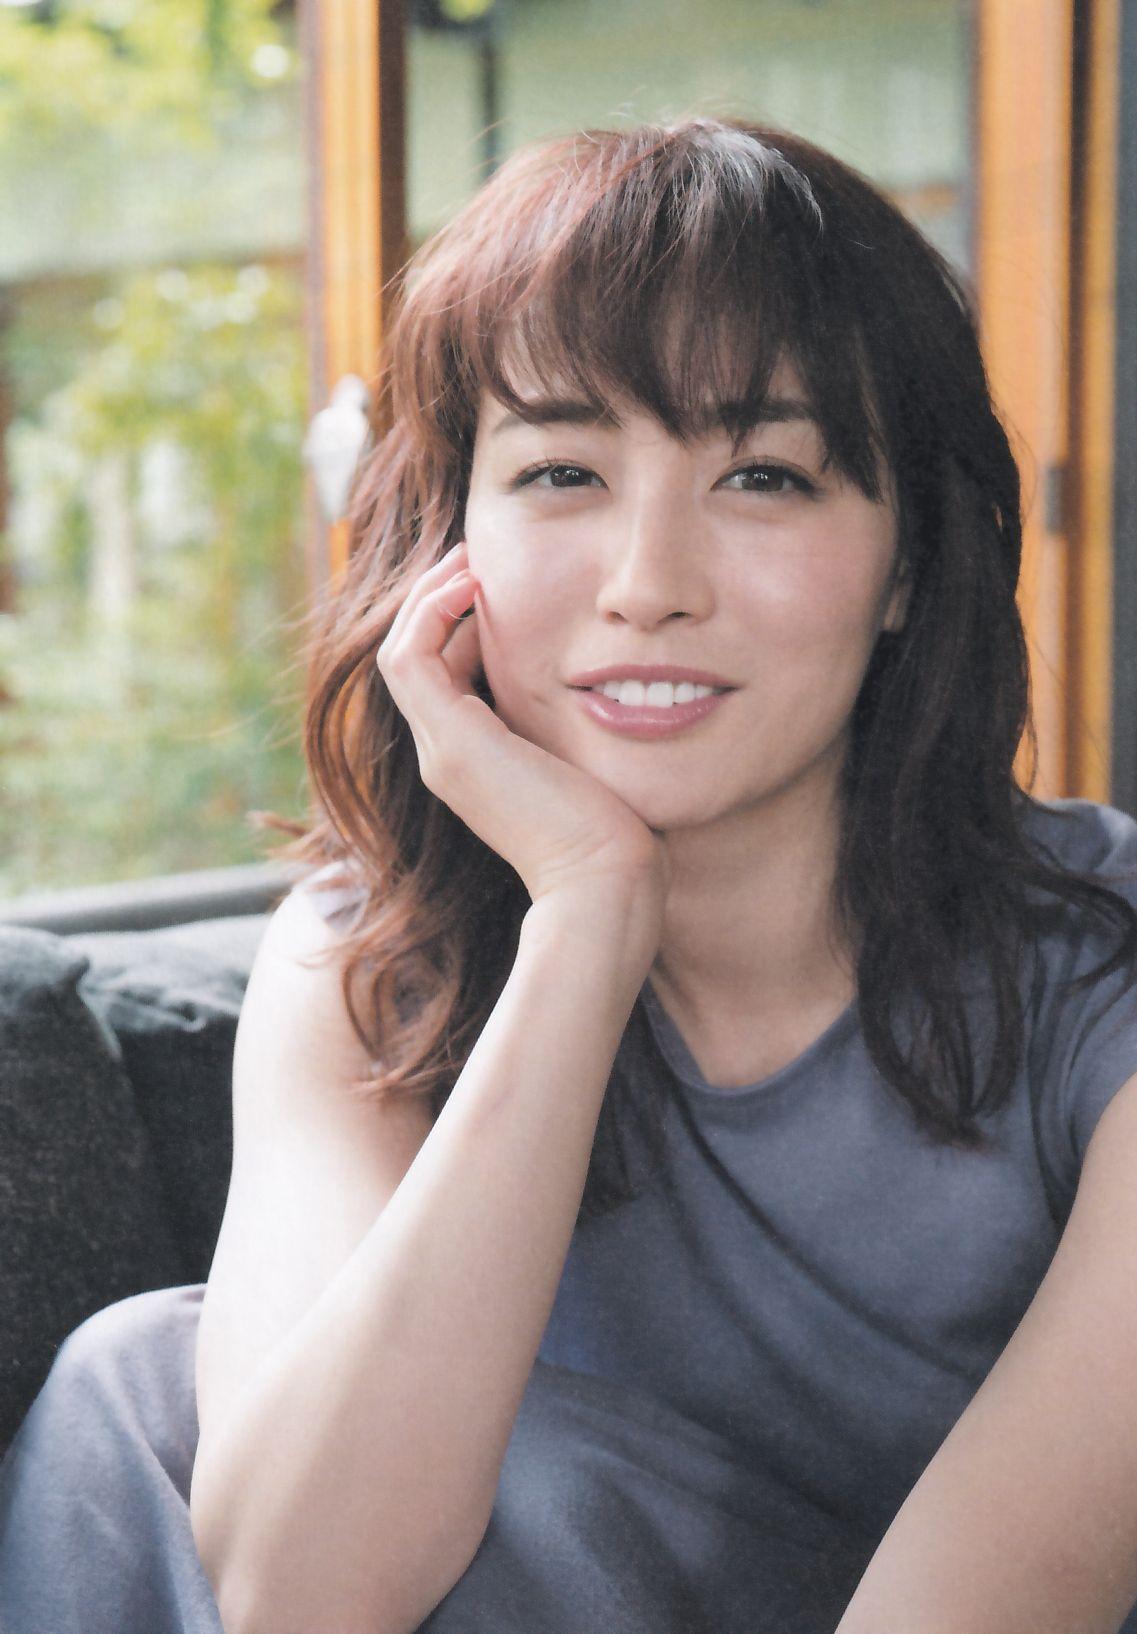 Tits Mature Naked Japanese Woman Pics